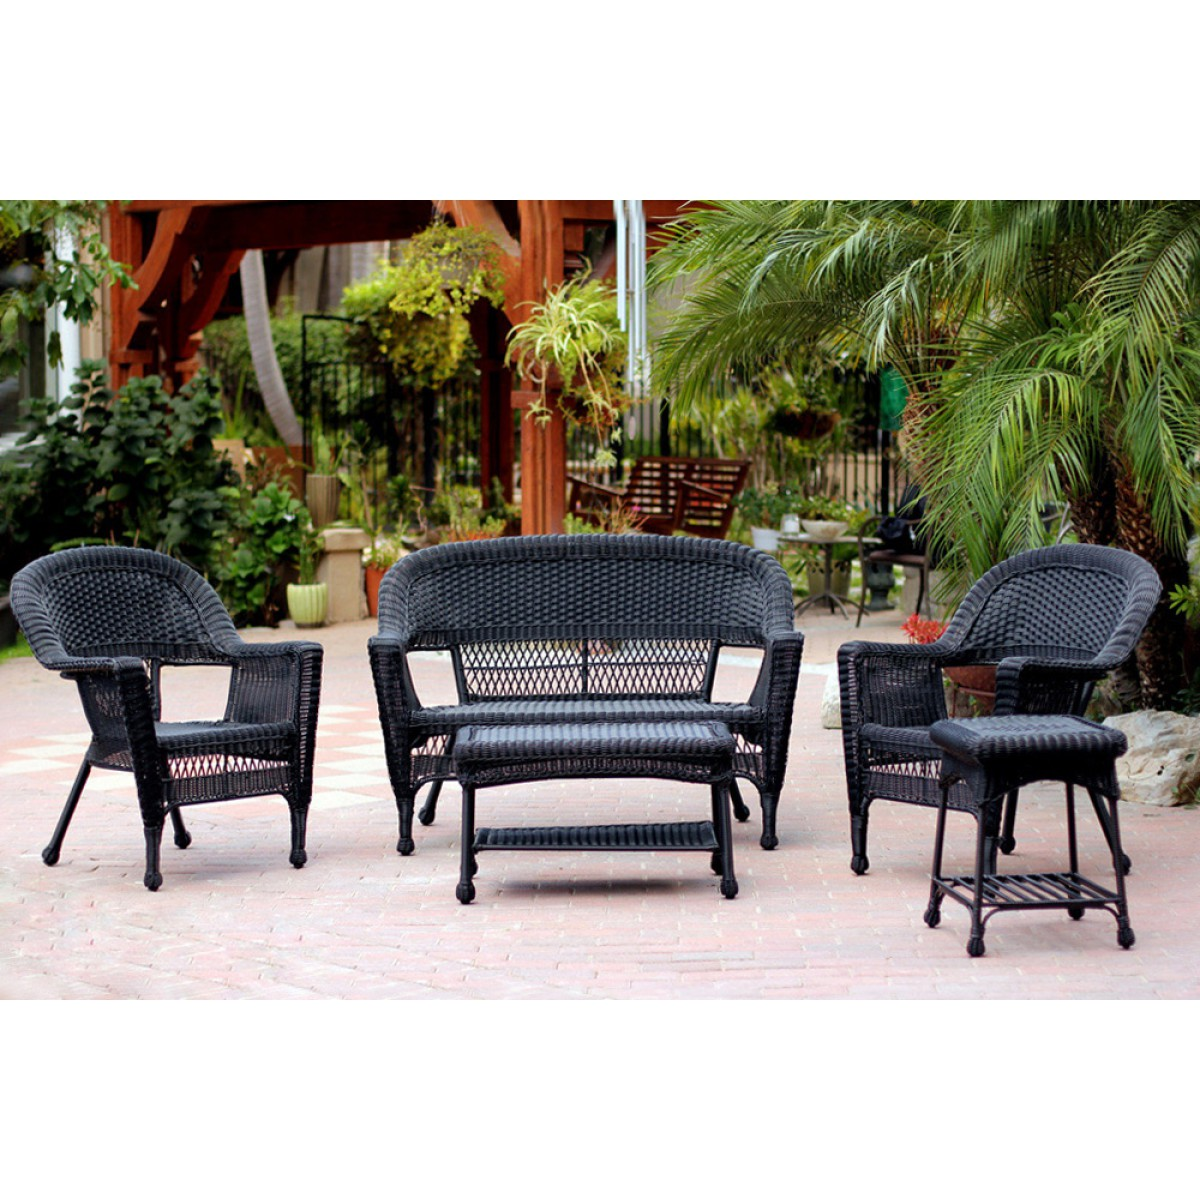 5pc Black Wicker Conversation Set Without Cushion